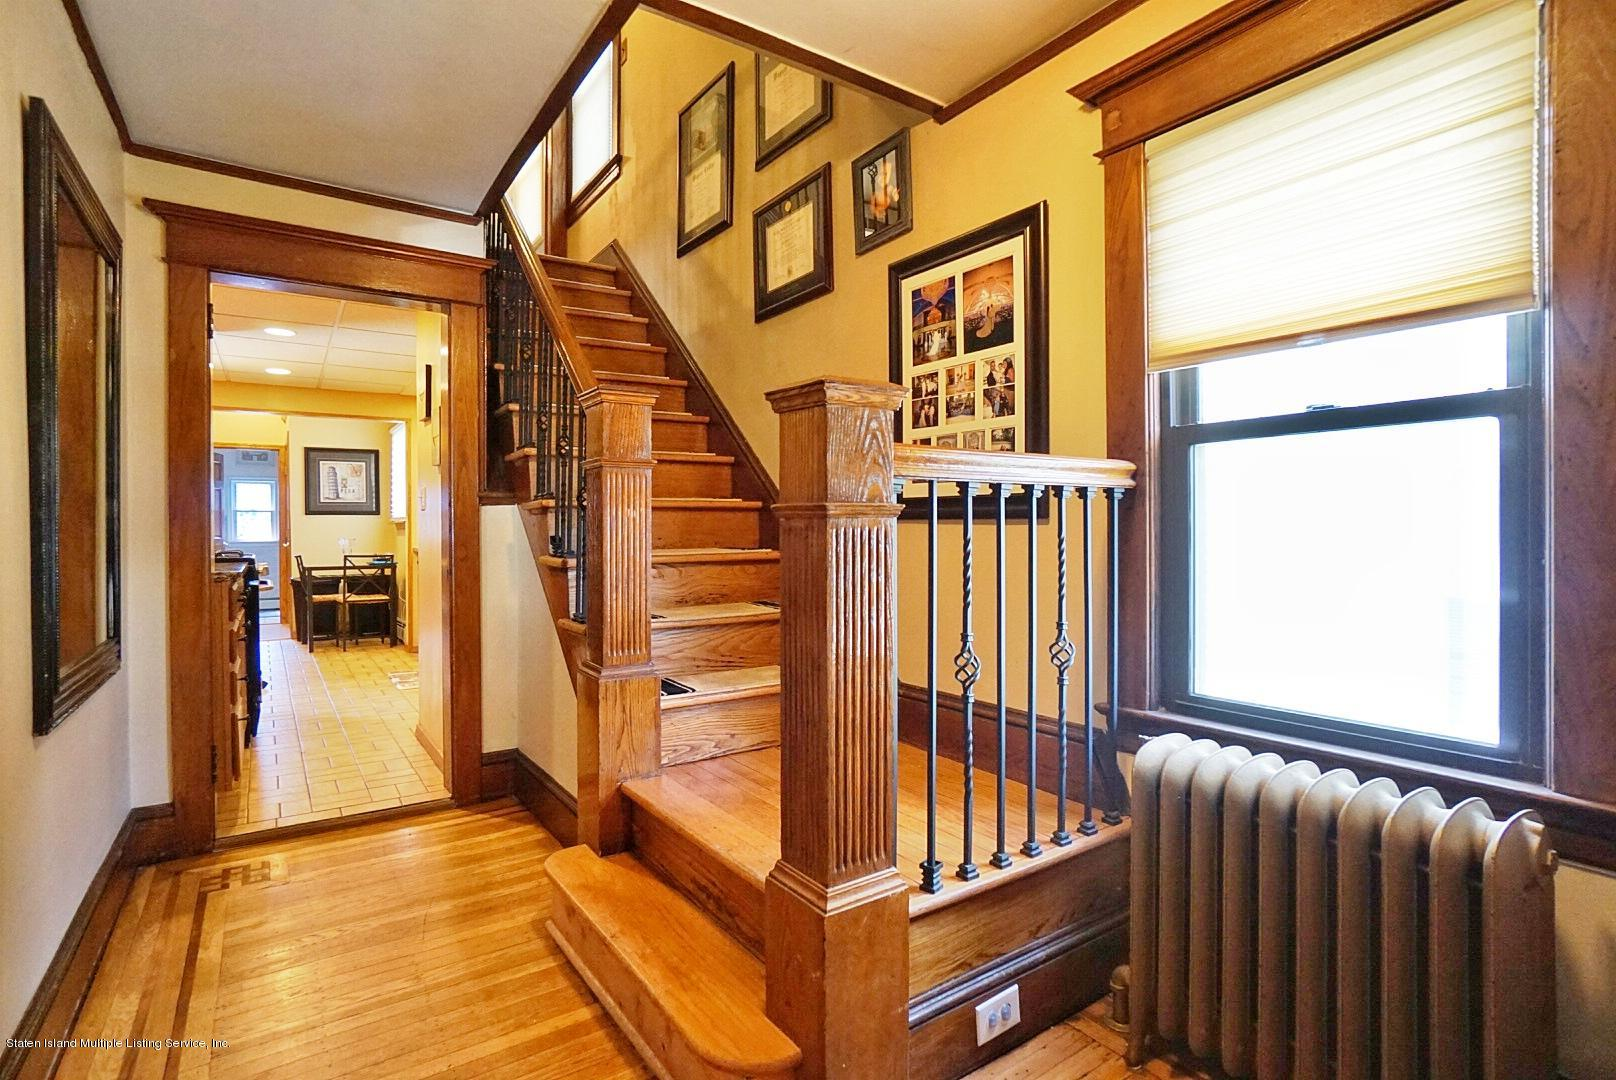 Single Family - Detached 22 Maine Avenue  Staten Island, NY 10314, MLS-1128323-11